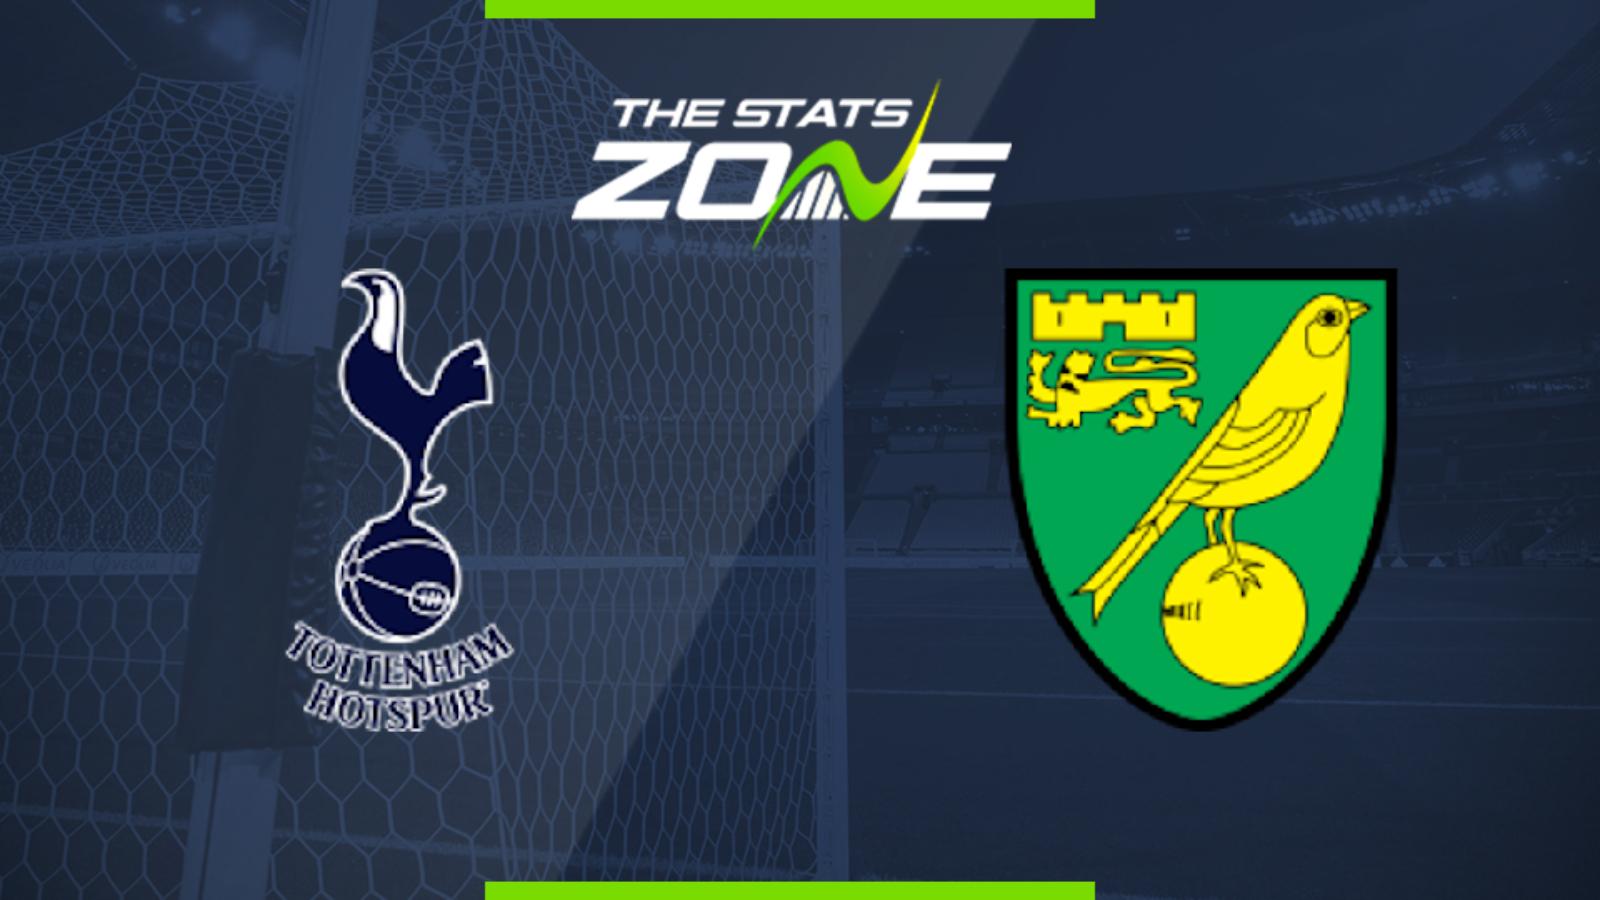 [Teams] Tottenham vs Norwich: Confirmed line-ups from the New Tottenham Stadium